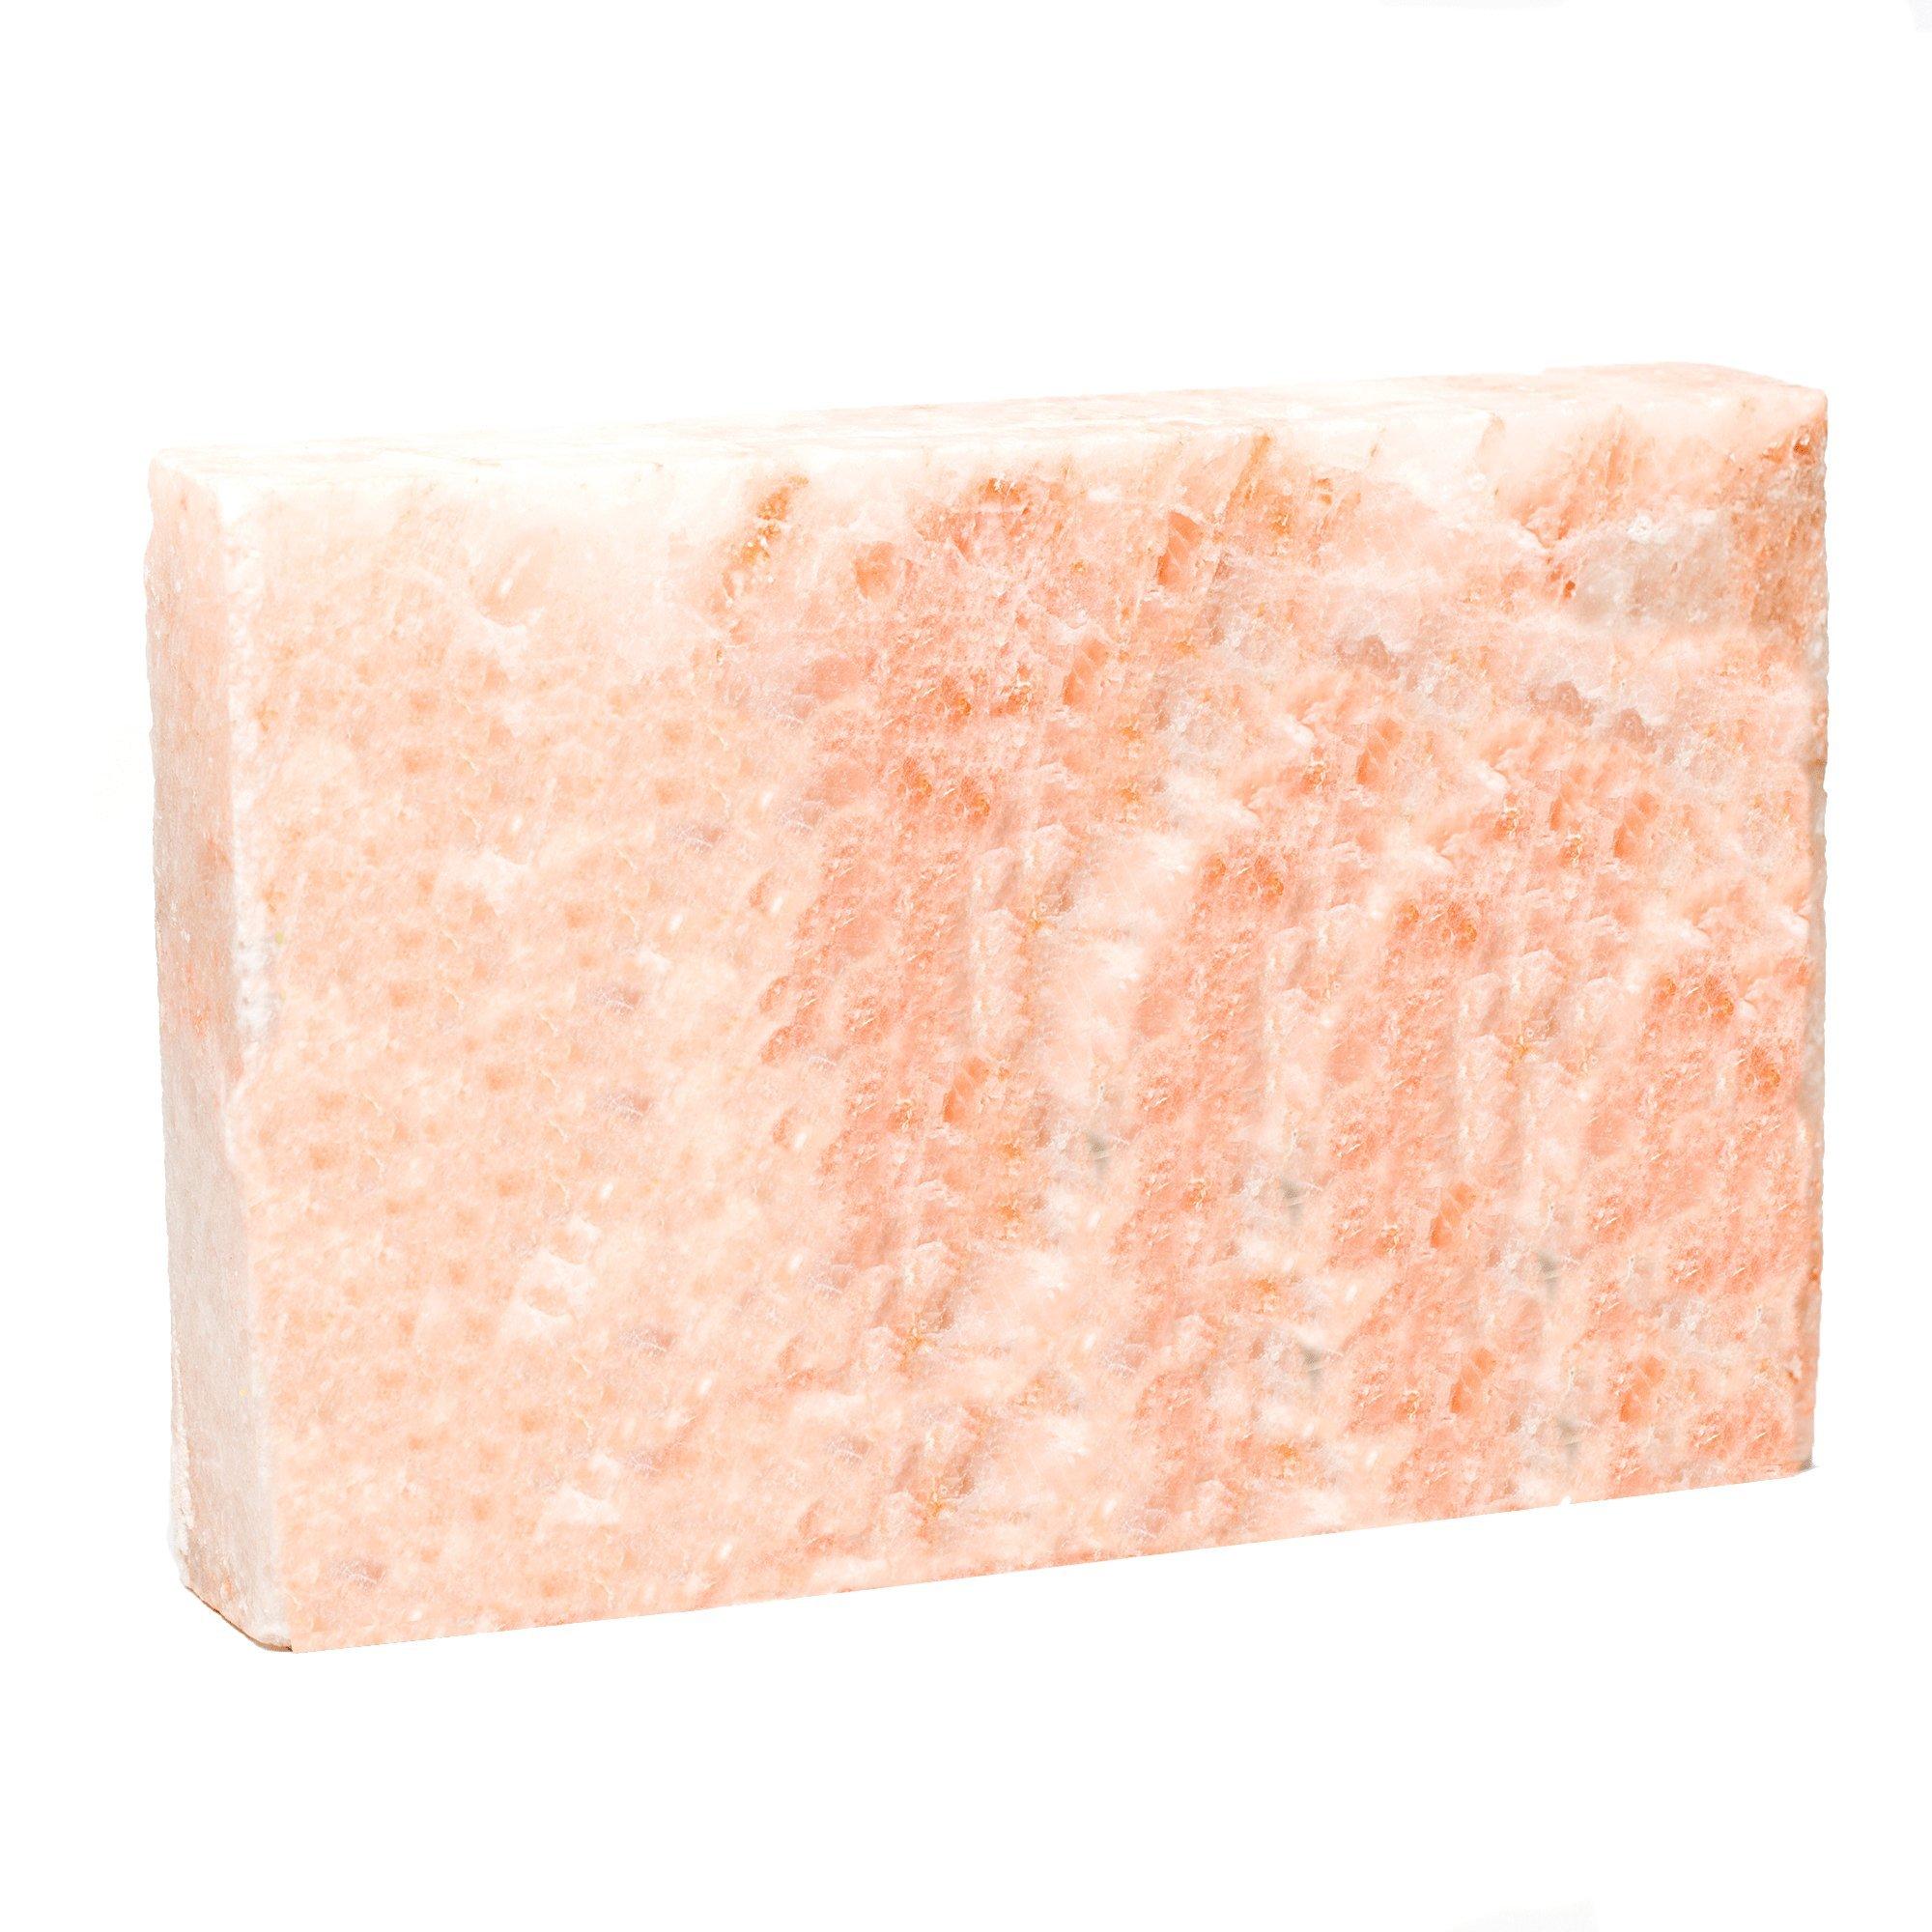 Salt Rox Natural Pink Himalayan Rock Cooking & Grilling Seasoning Stone, Large by Salt Rox (Image #1)